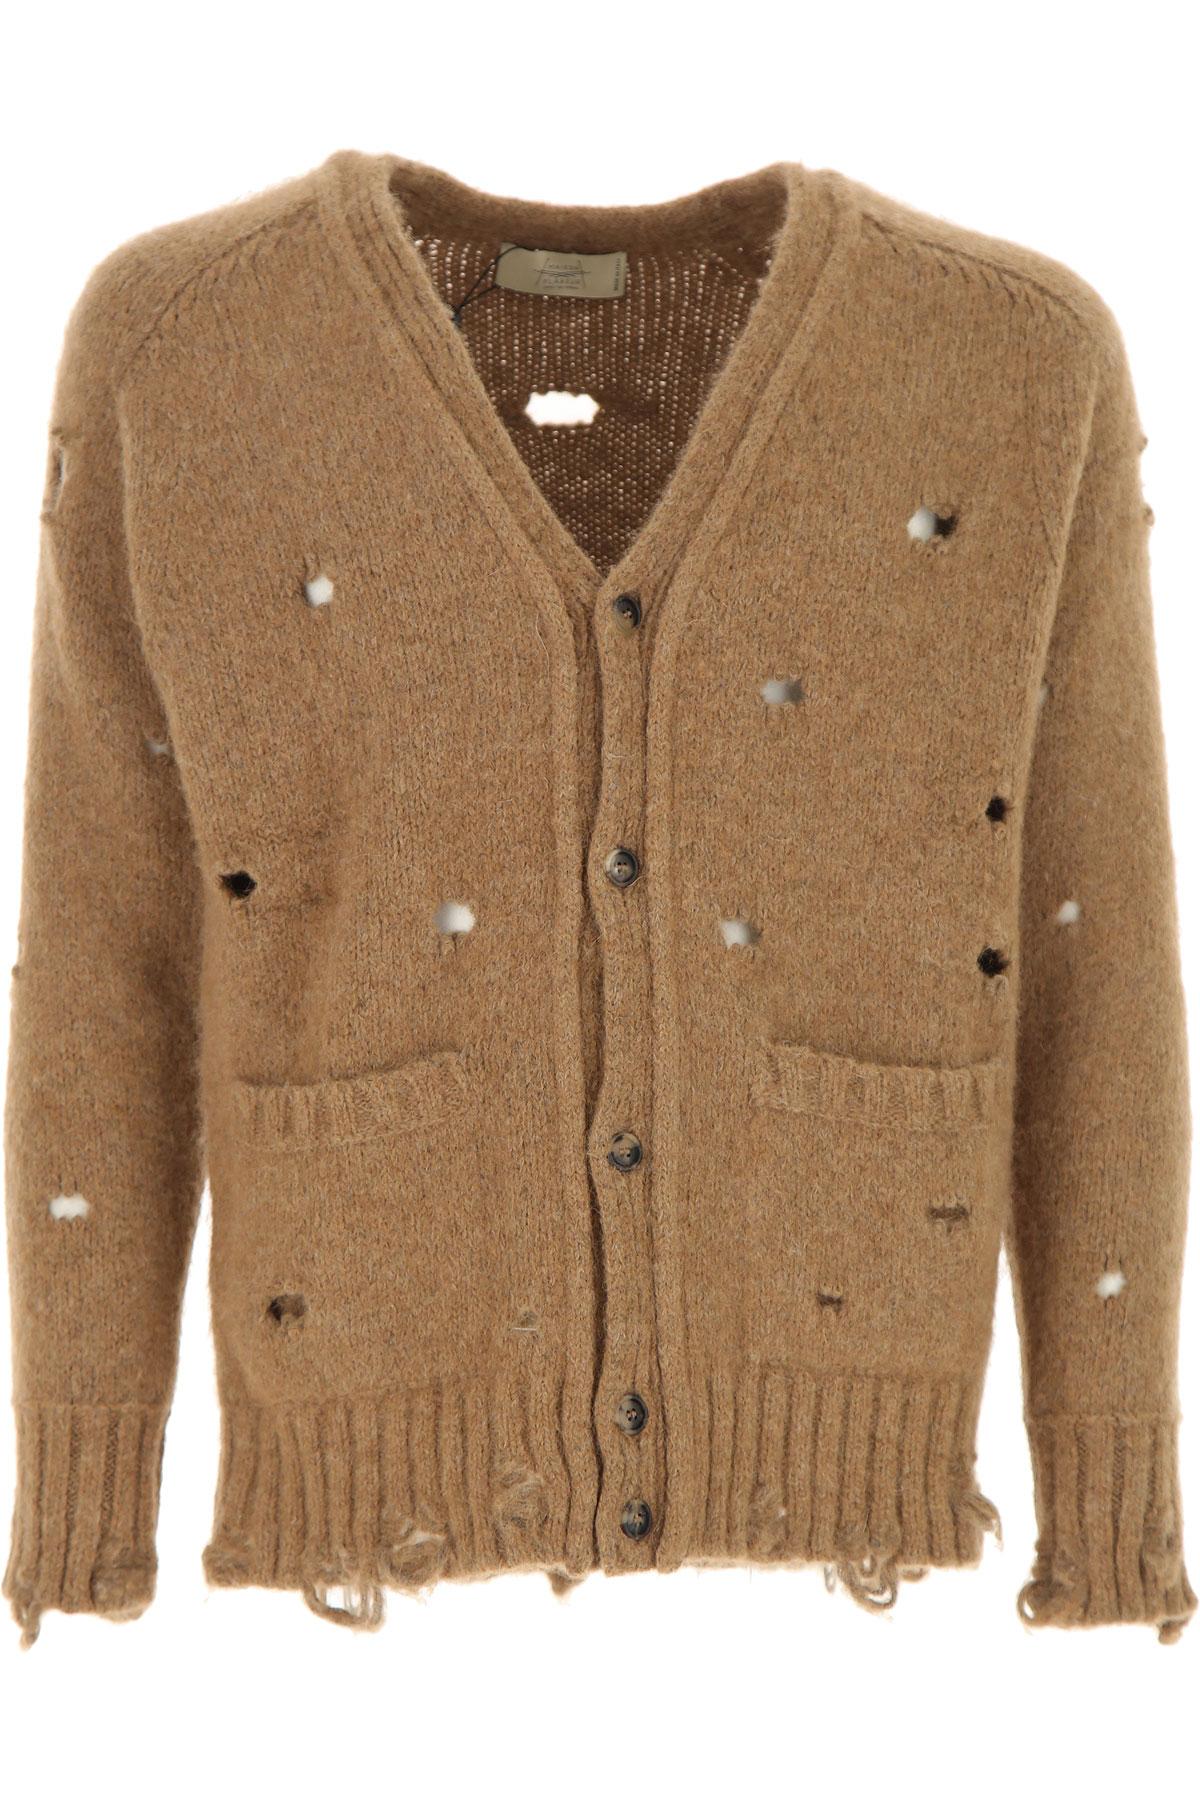 Image of Maison Flaneur Sweater for Men Jumper, Camel, alcapa, 2017, L M XL